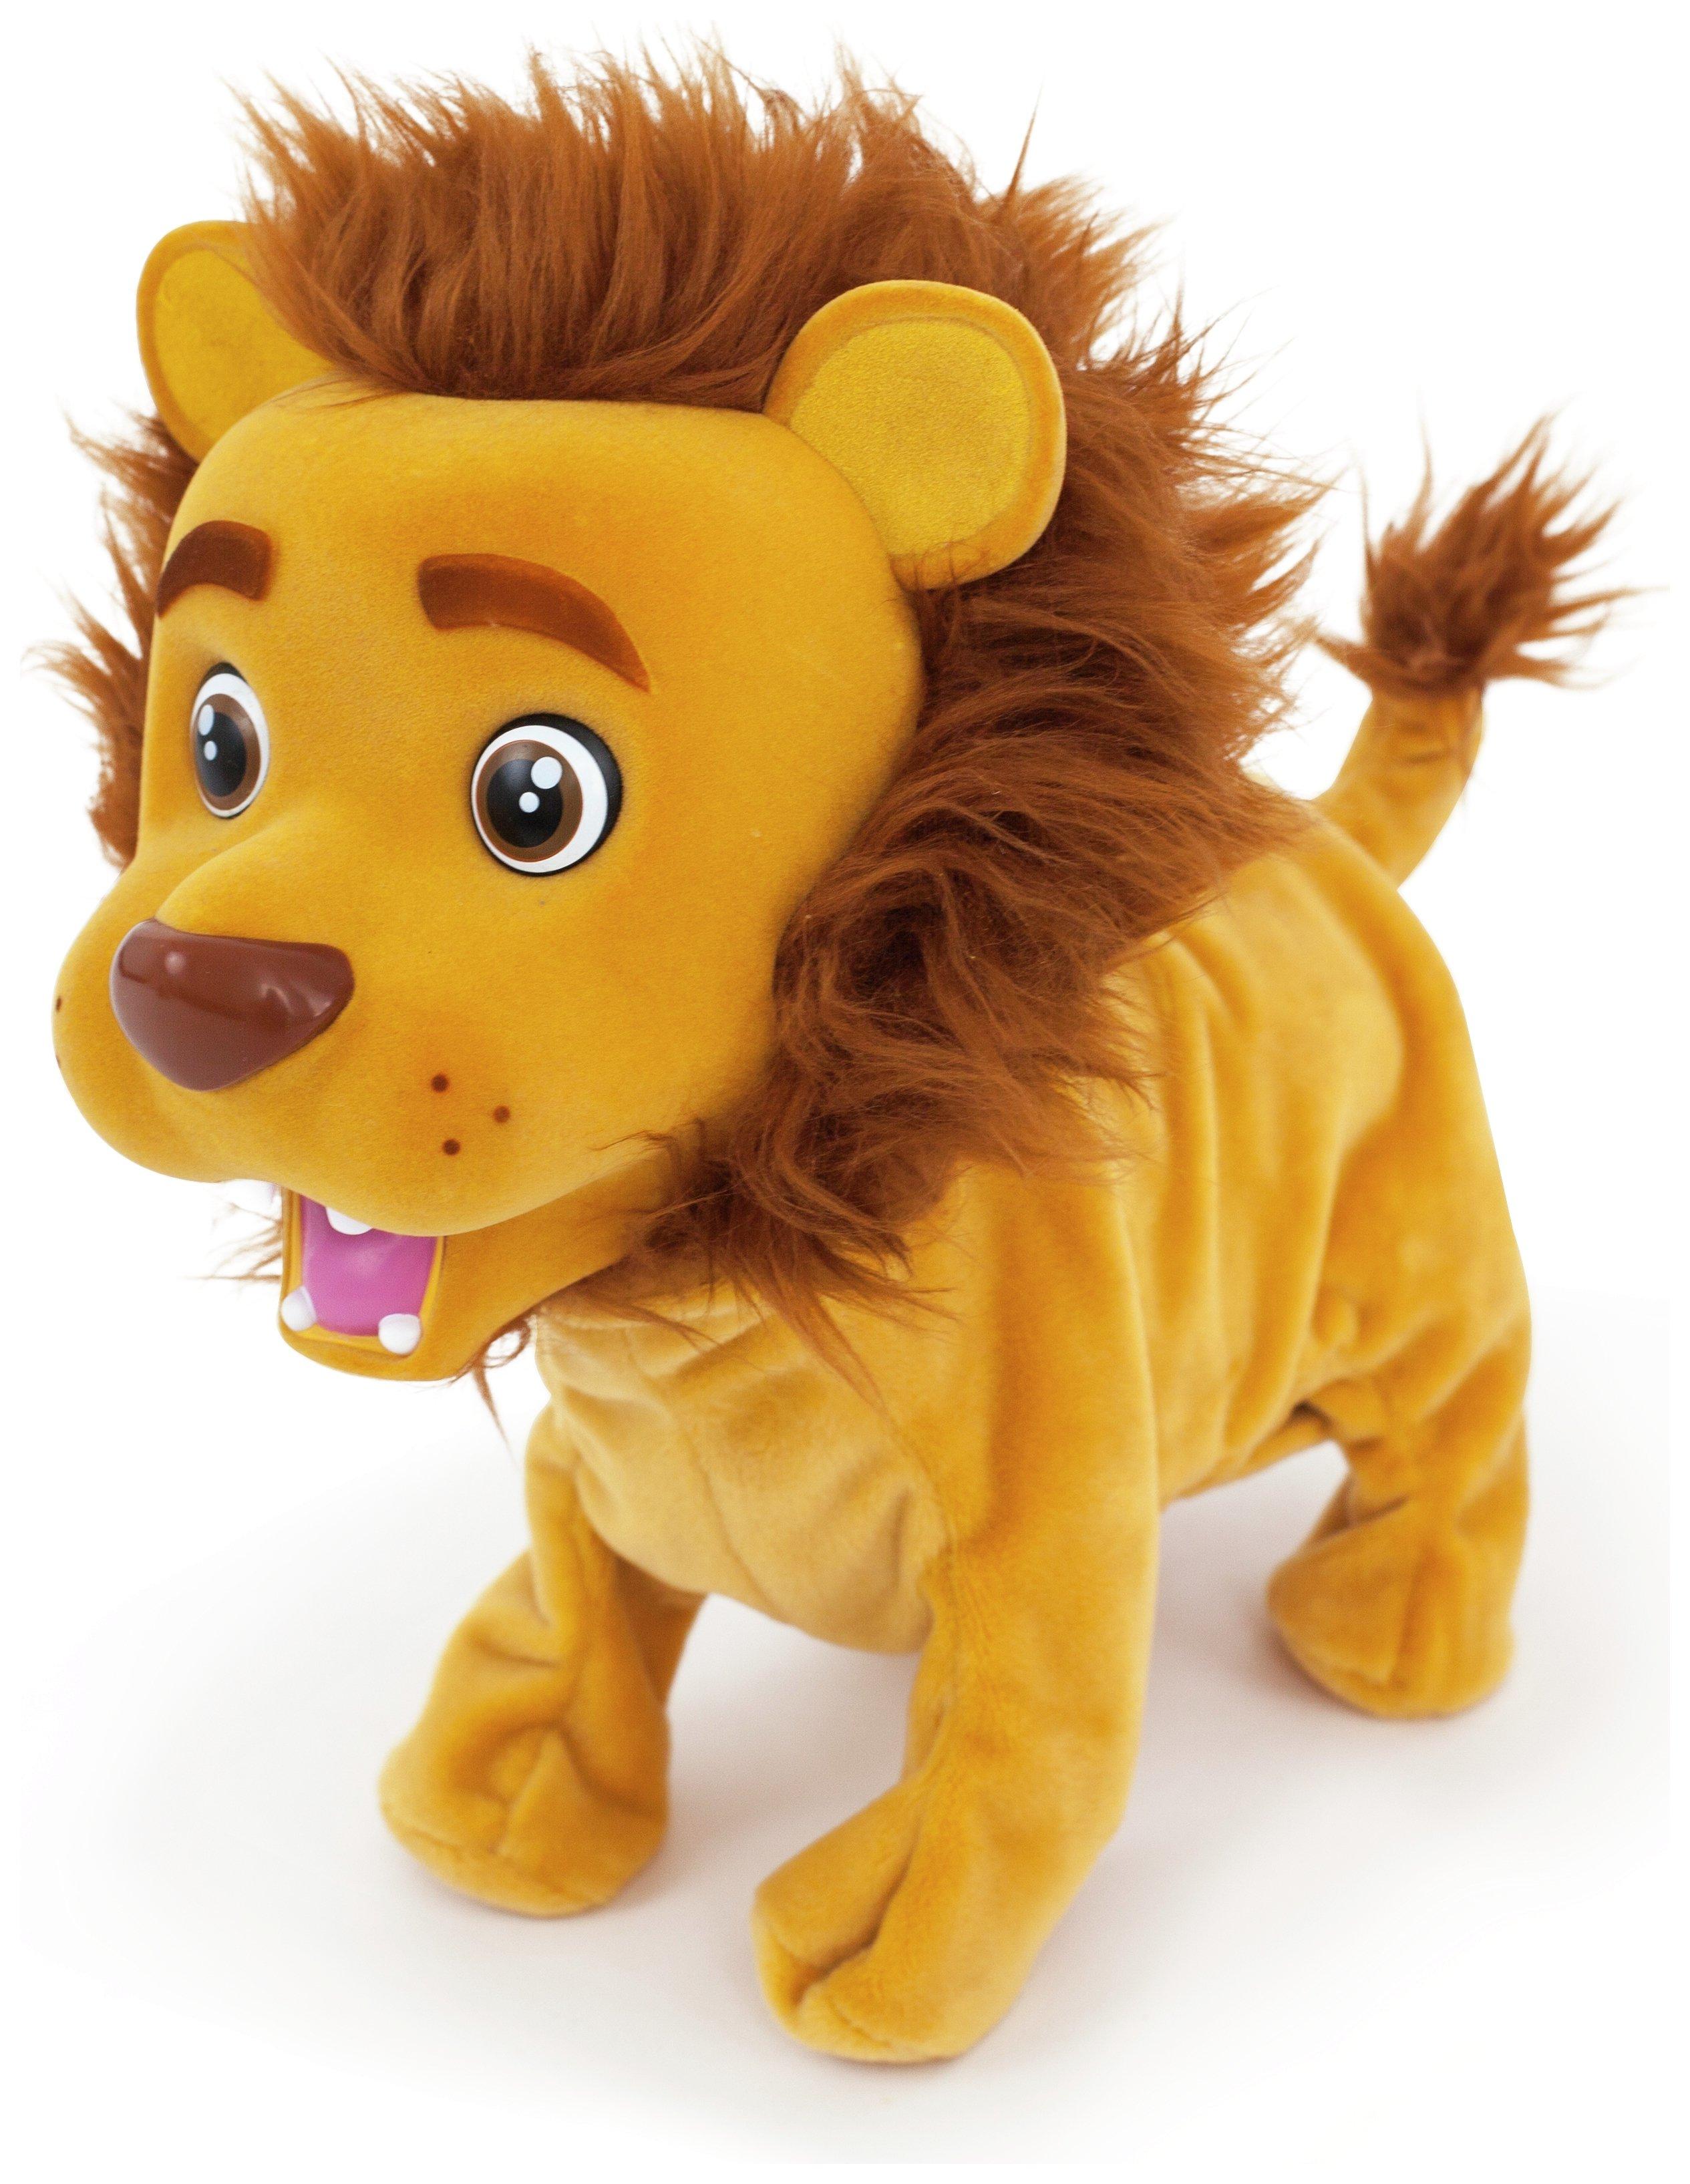 Image of Club Petz Kokum the Little Lion Interactive Plush.